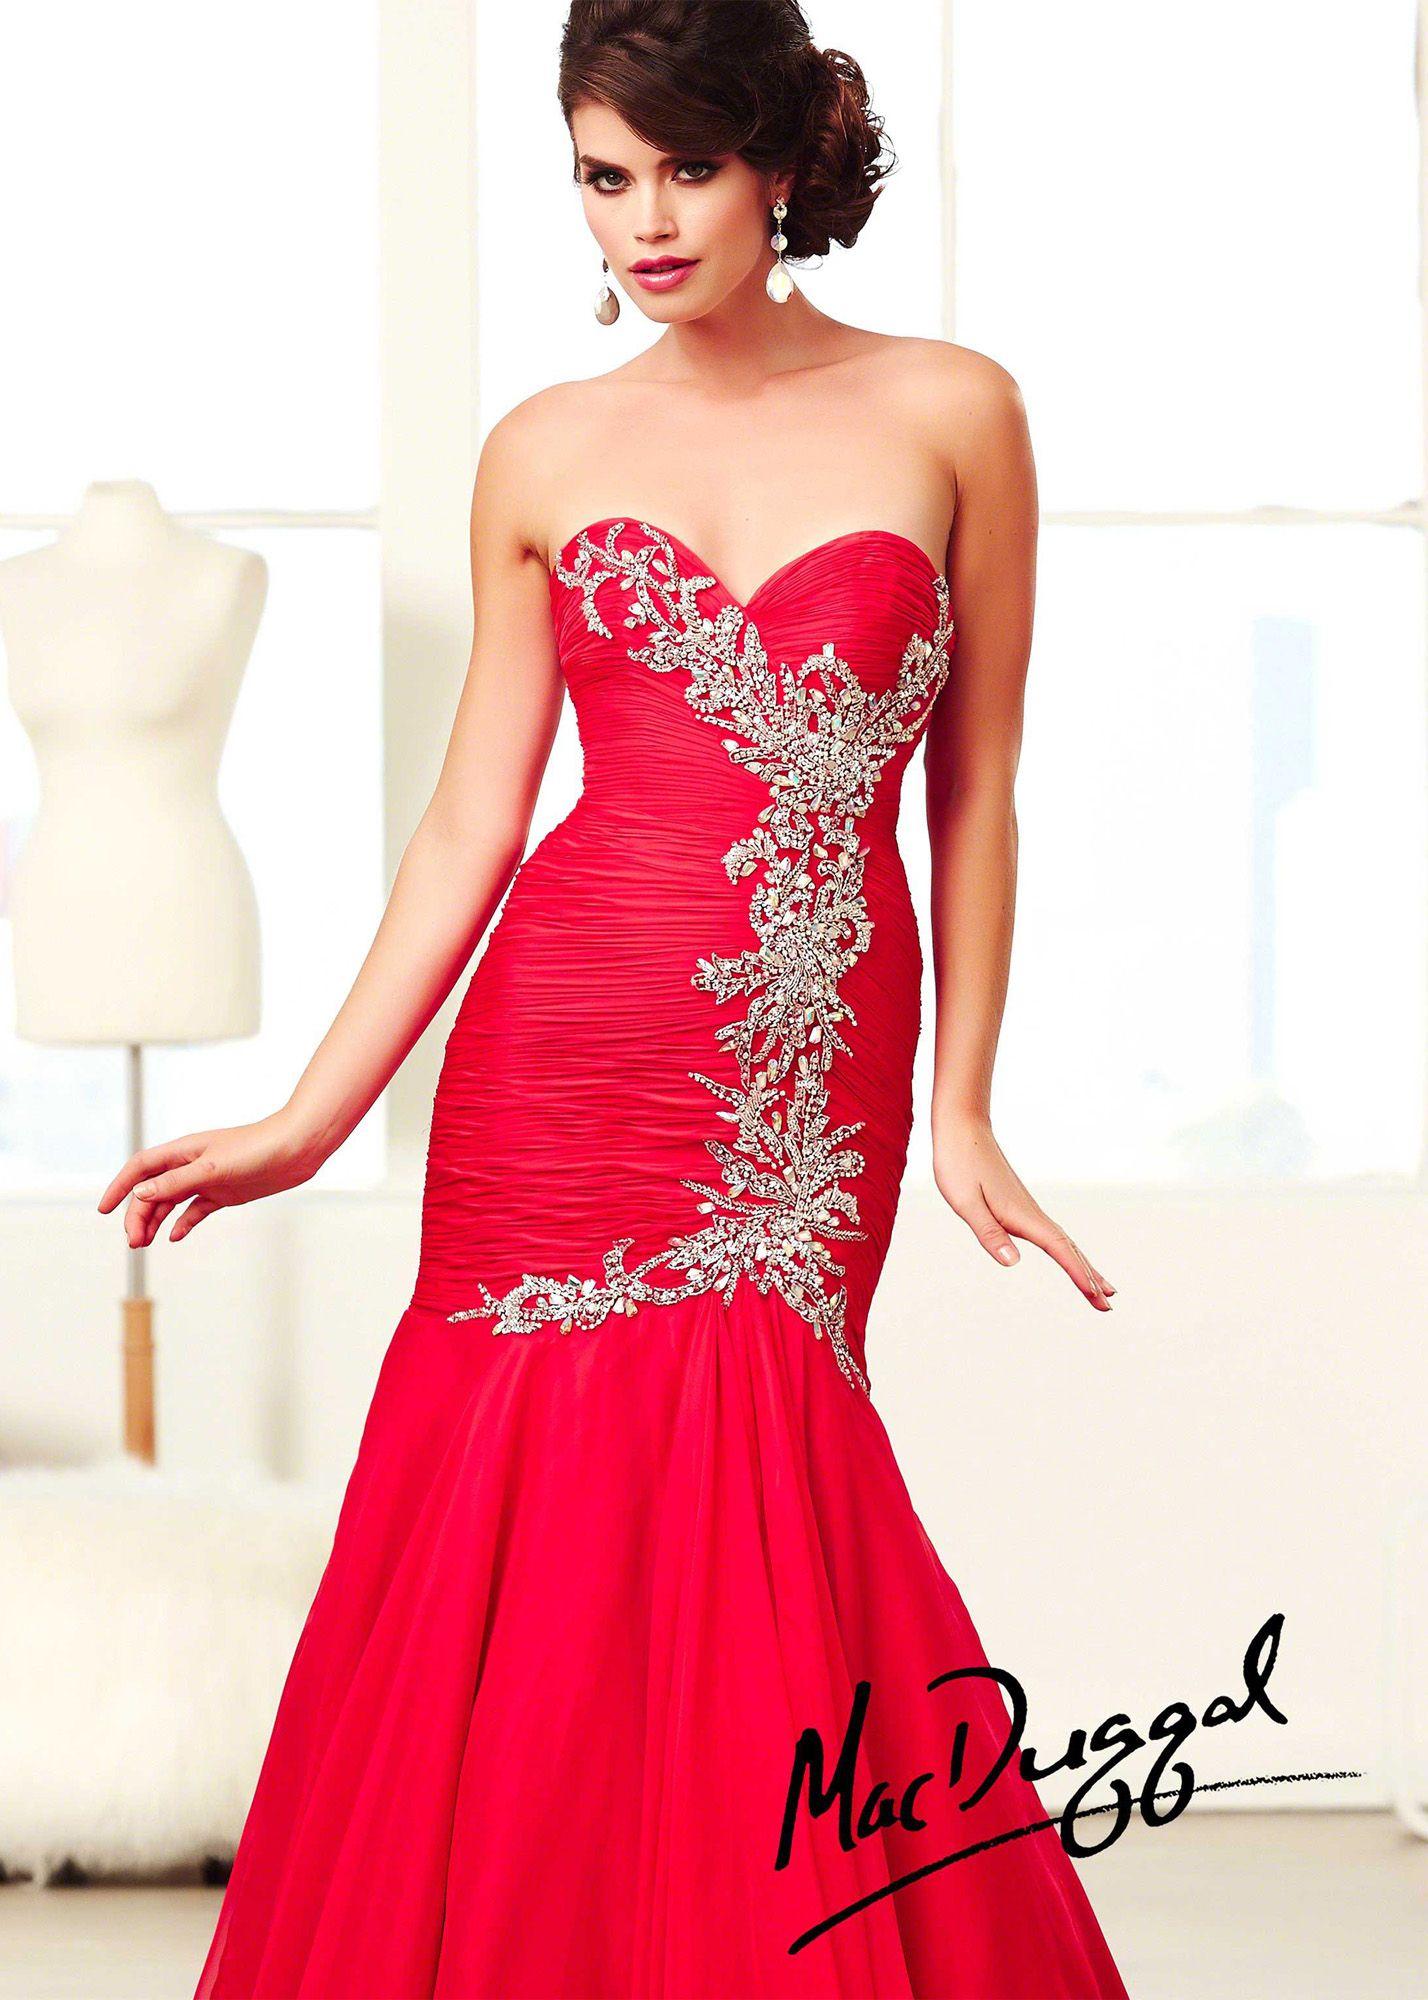 Mac duggal h cherry strapless mermaid prom dresses online